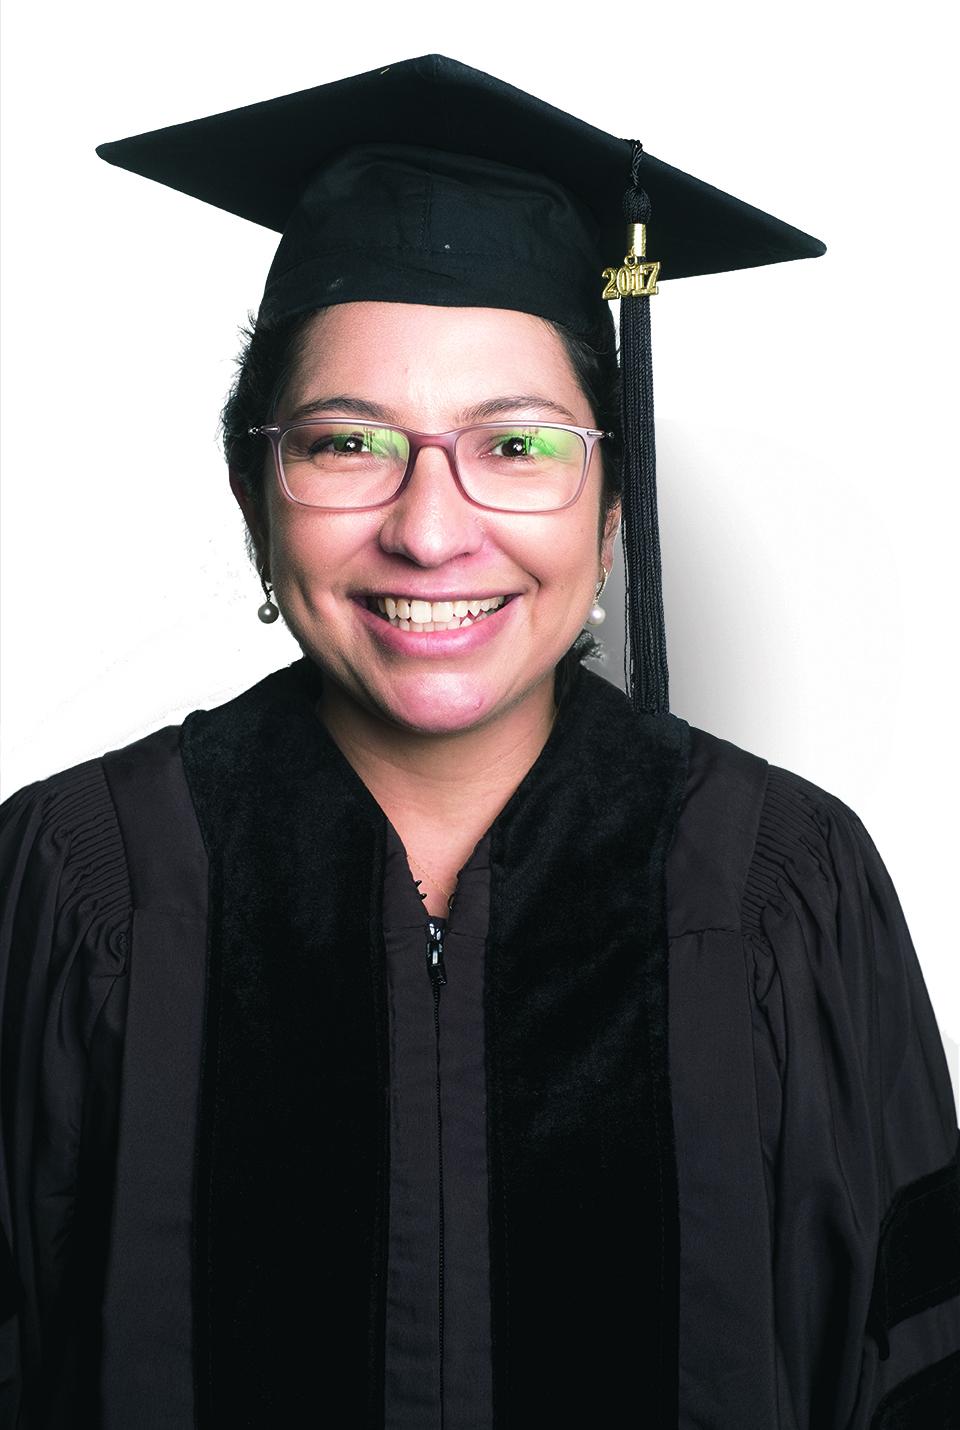 Violeta Rayon Estrada